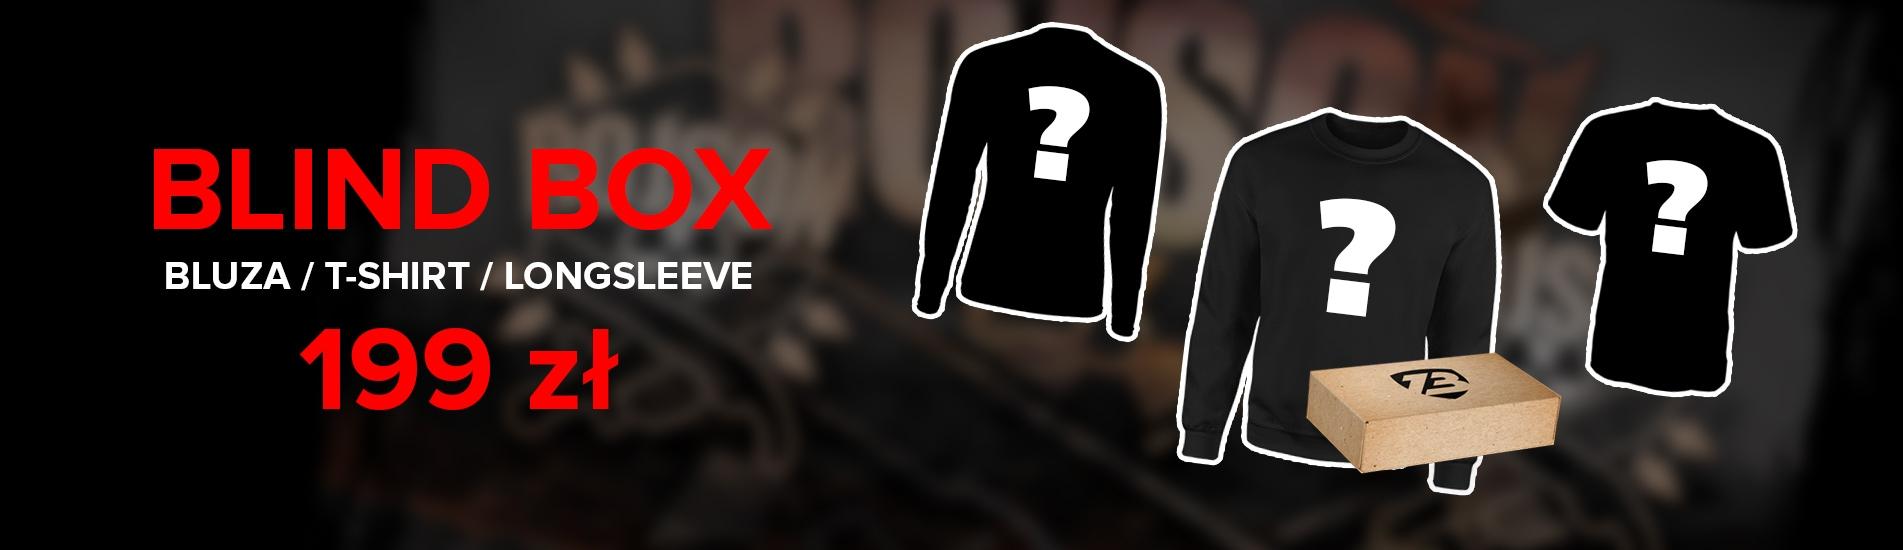 Losowa bluza + t-shirt + longsleeve